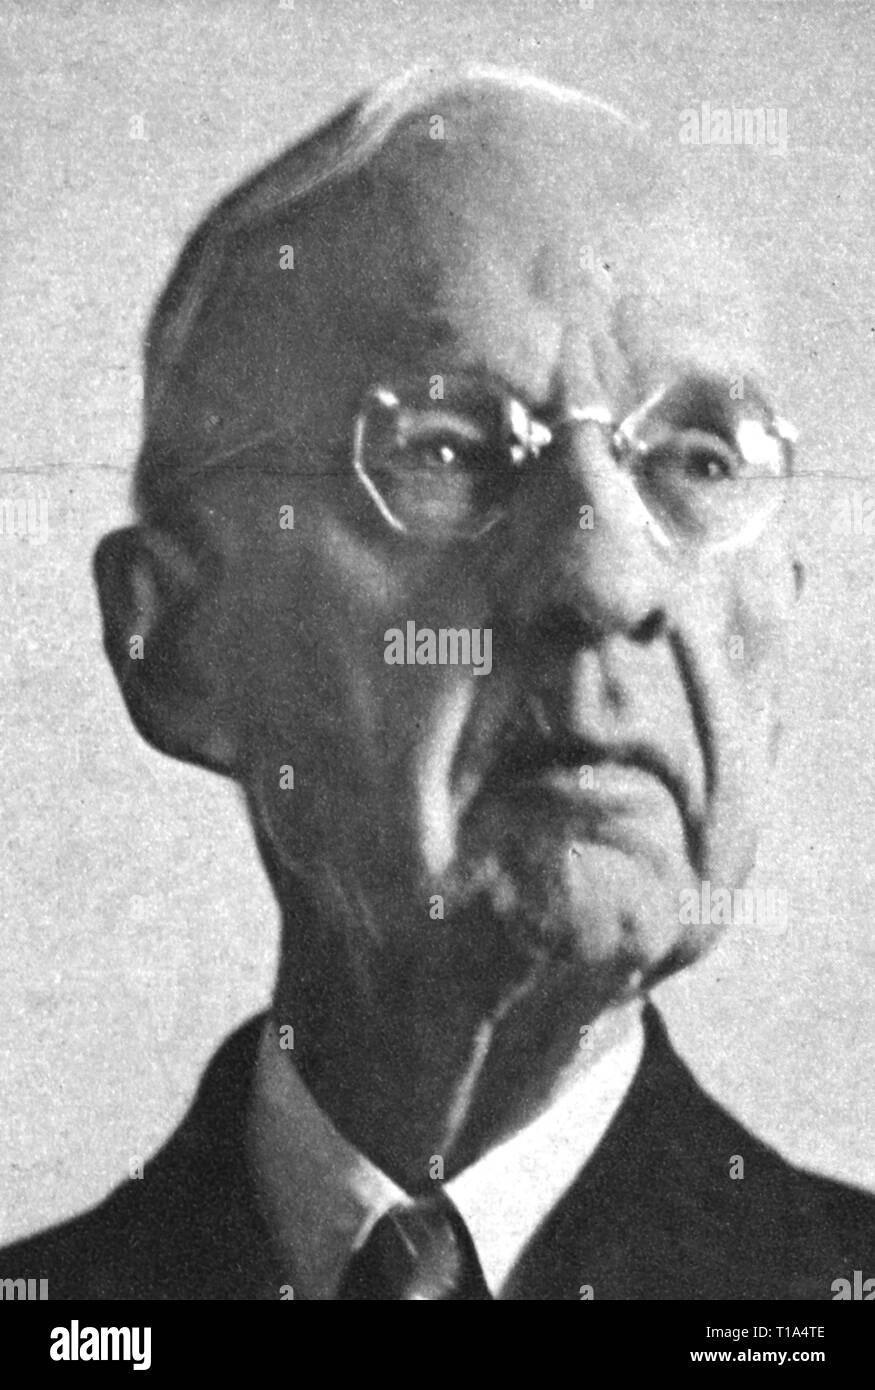 "Religion, Sekte, Mormon, Rudger Clawson, 1857 - 1943, Präsident der Zwölf Apostel, Porträt, aus: ""Life Magazine"", New York, Januar 1938, Additional-Rights - Clearance-Info - Not-Available Stockbild"